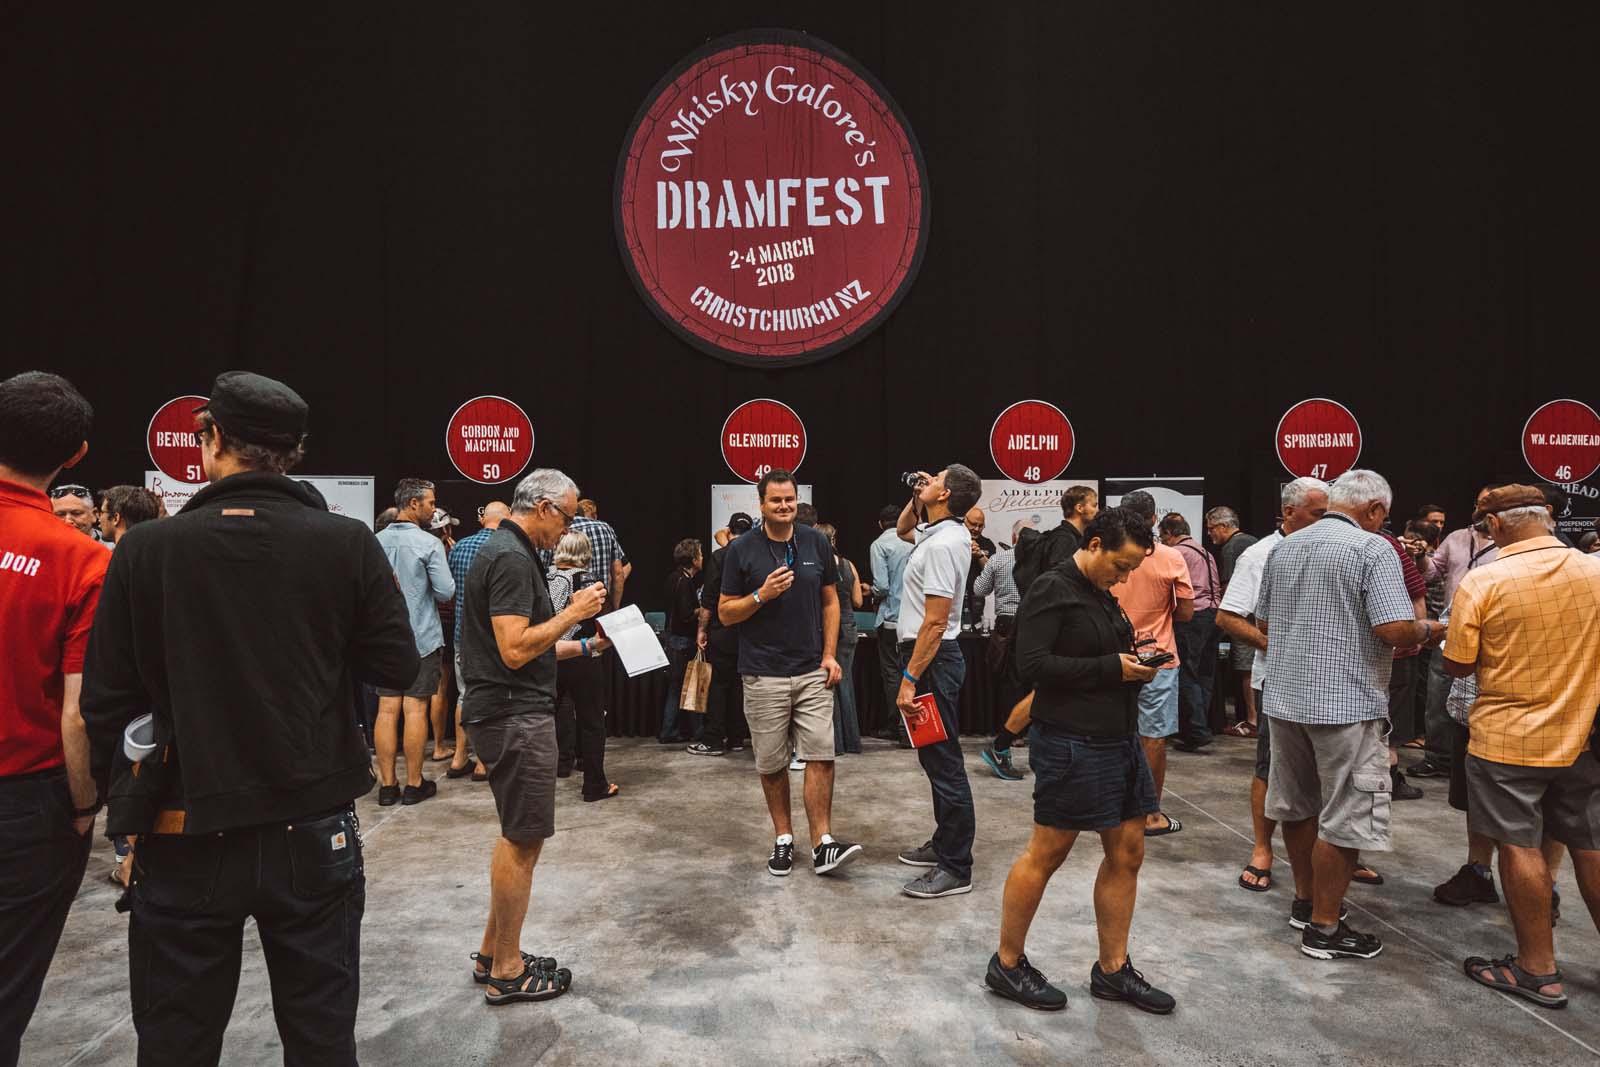 Dramfest 2018 for Whisky Galore-277.jpg